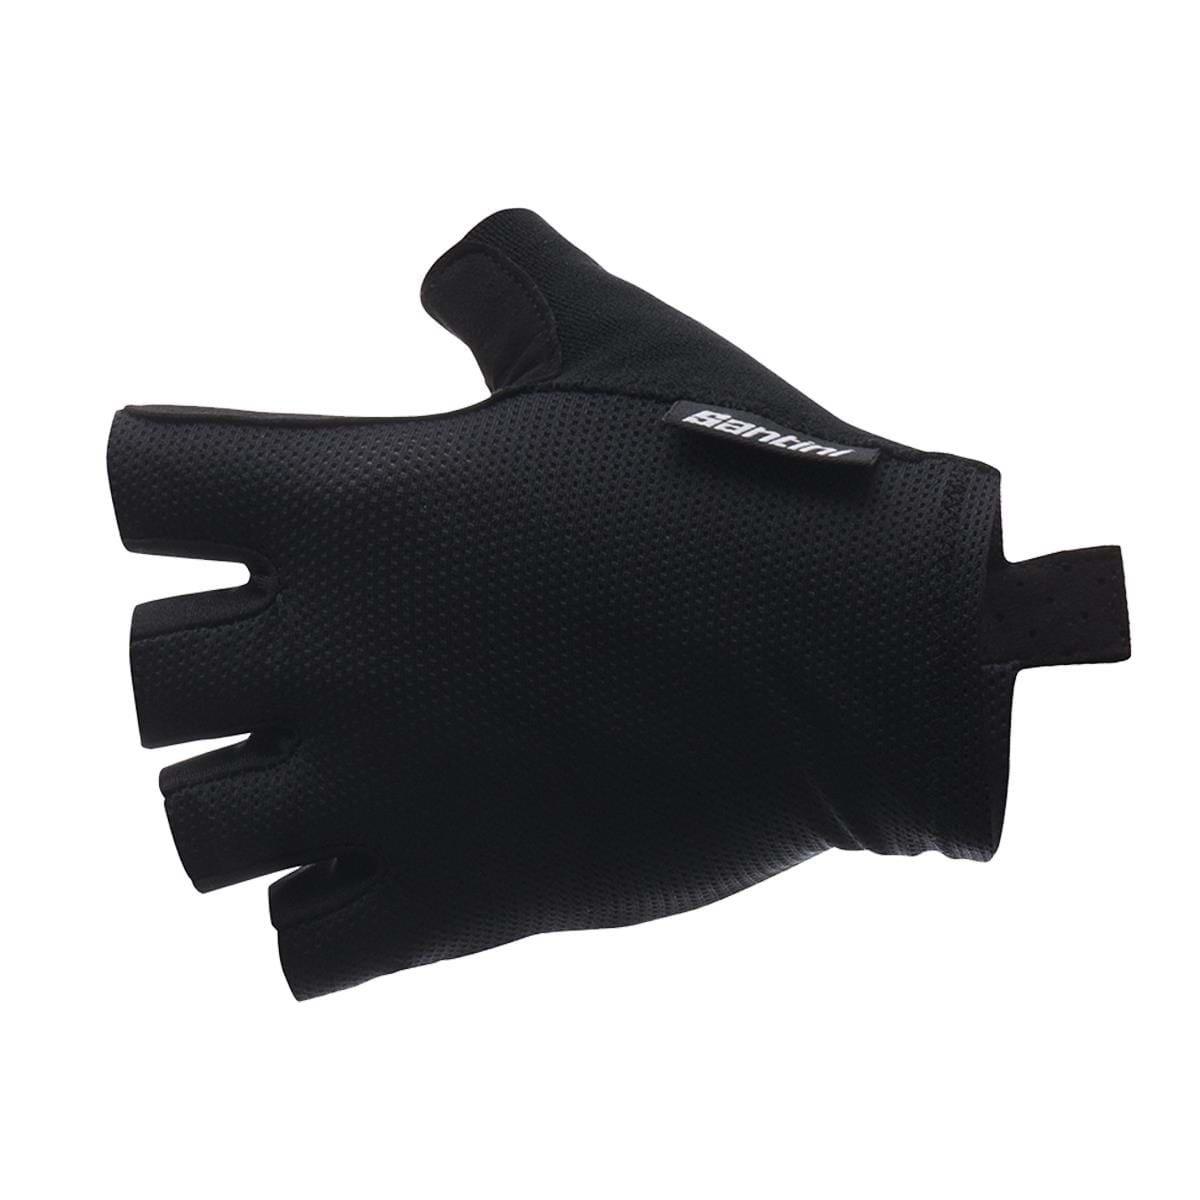 Santini SANTINI 365 BRISK SHORT FINGER GLOVE: BLACK XL